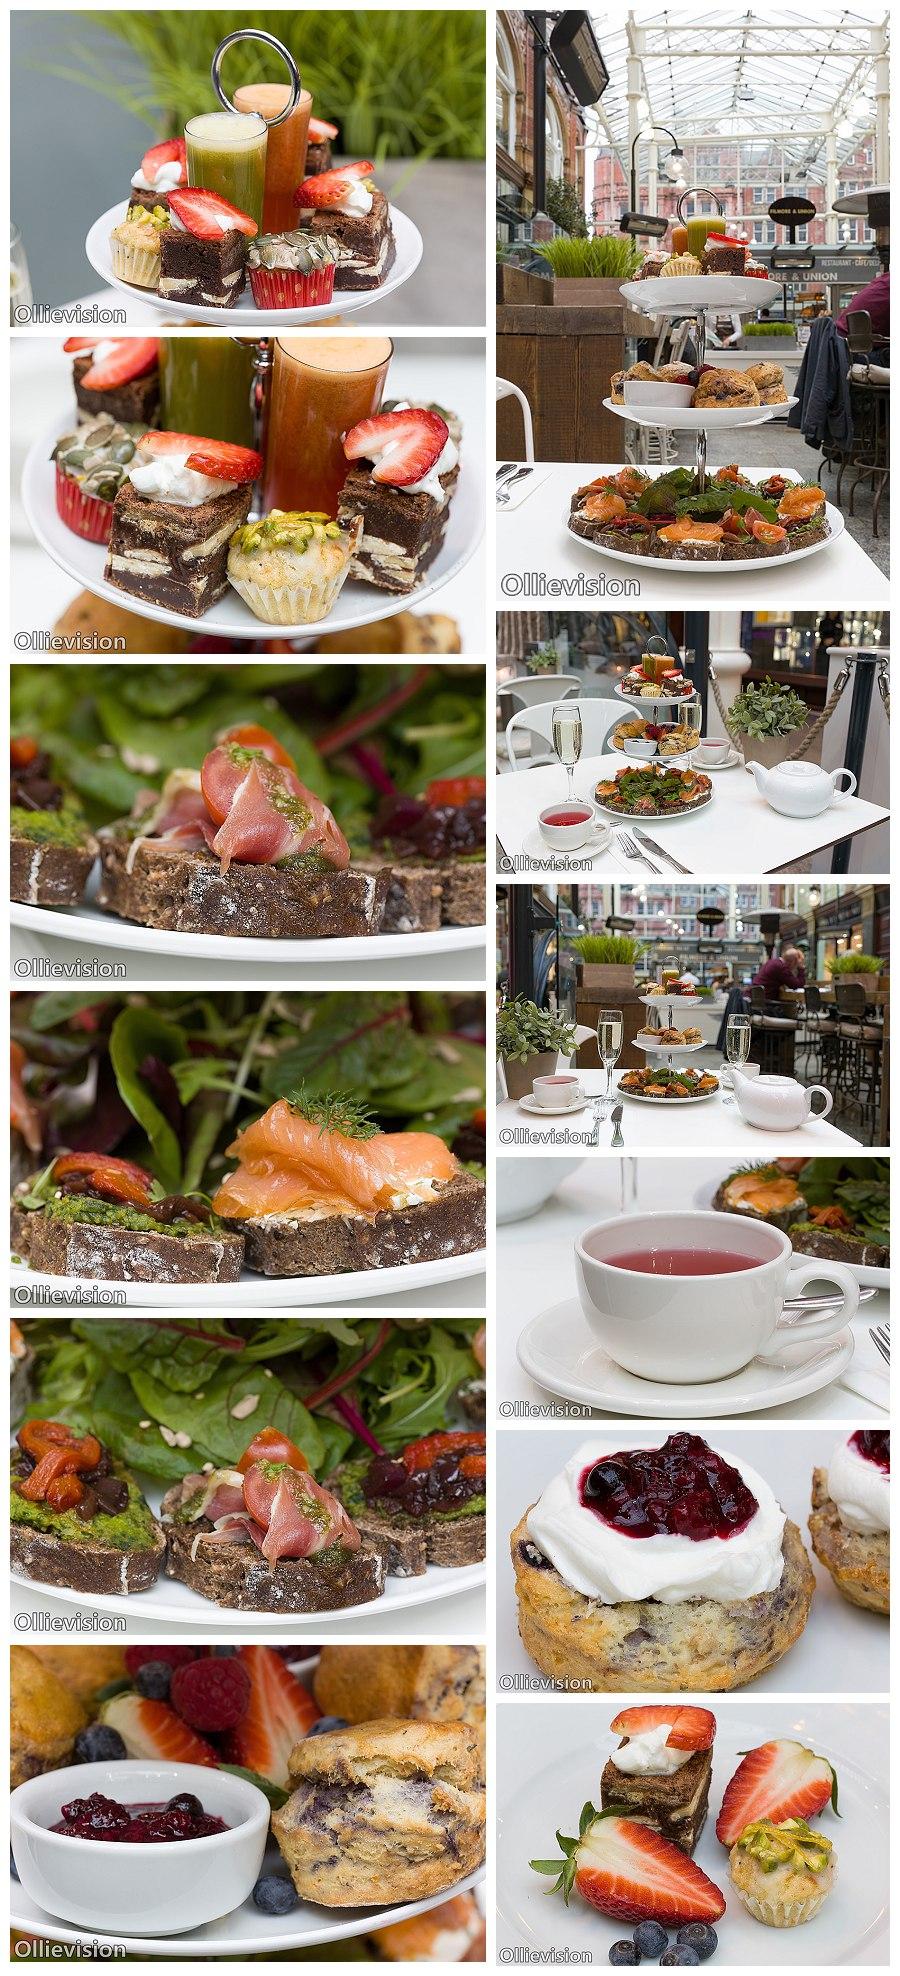 Leeds Food Photographers, photographer Leeds